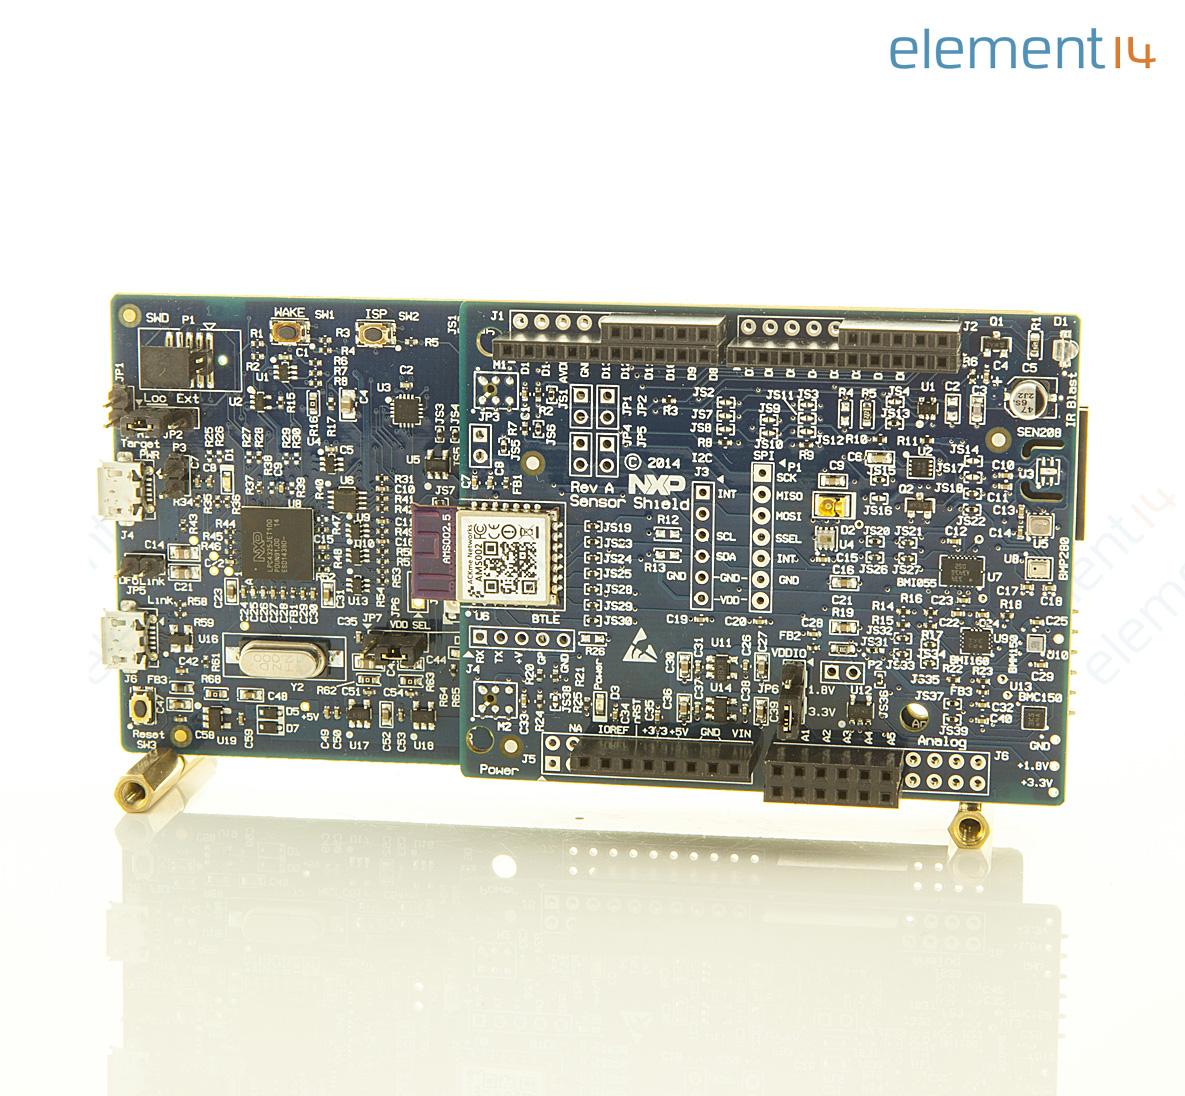 Om13078 Nxp Evaluation Module Sensing Inertial Digital Compass Circuit Richmedia 391kb En